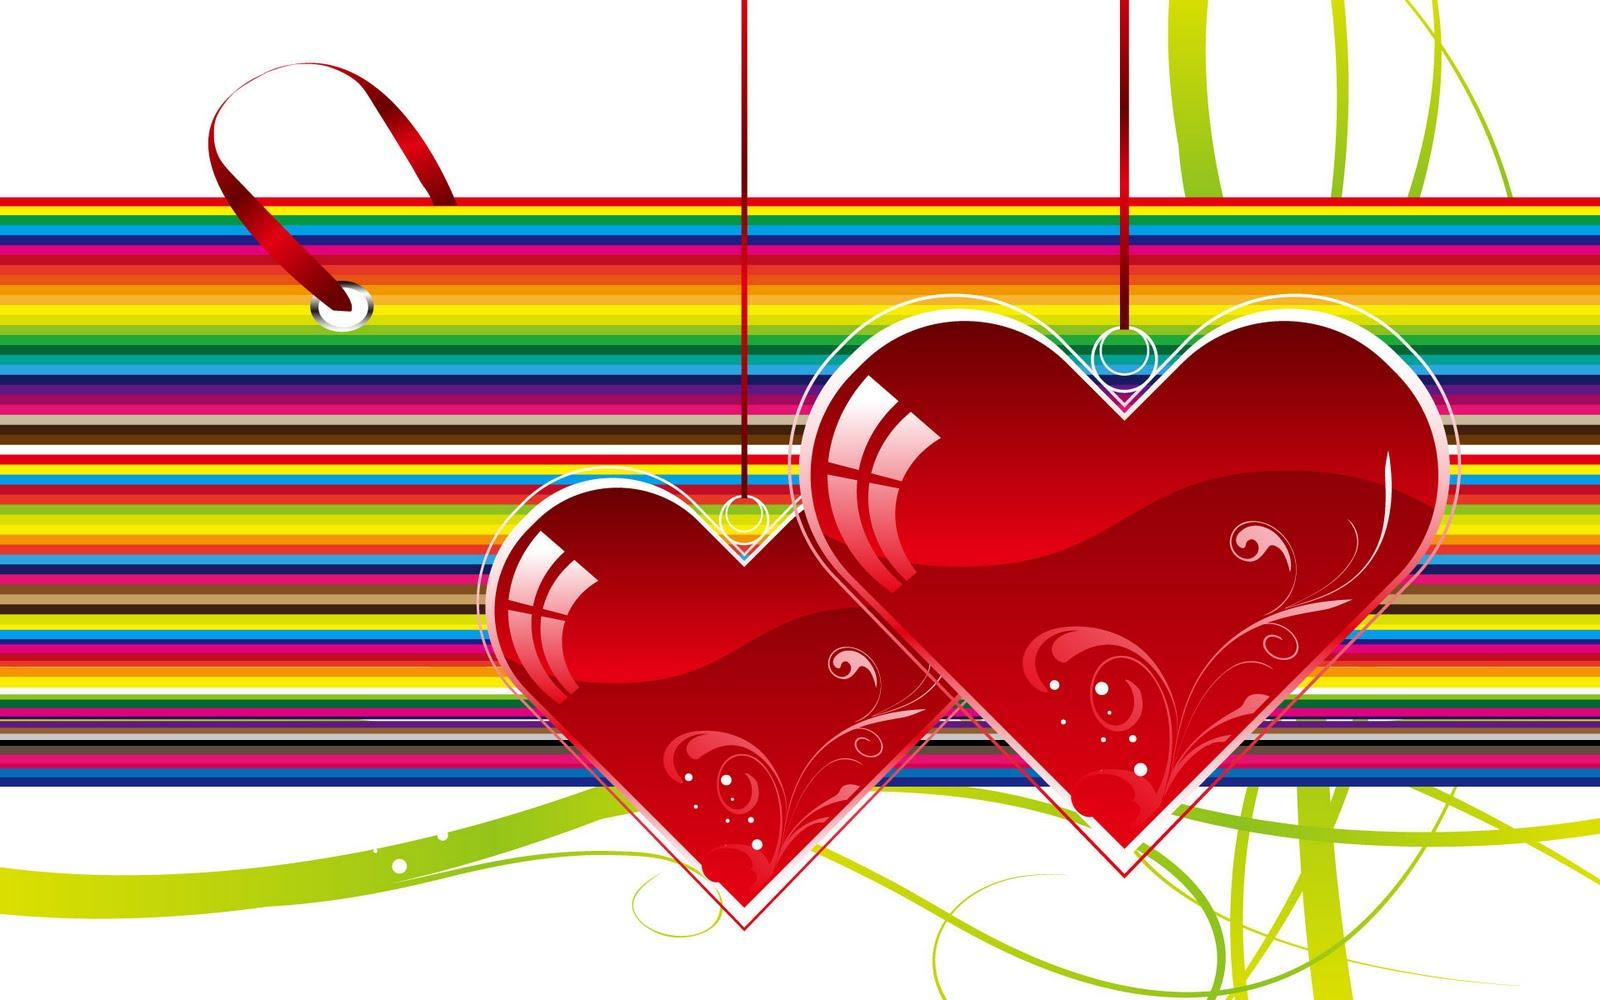 http://1.bp.blogspot.com/_81Ugo8jLT1Y/TTYMmfJ7ZNI/AAAAAAAAACk/mEeqNsnsBtI/s1600/Love-Wallpaper-love-4187467-1920-1200.jpg